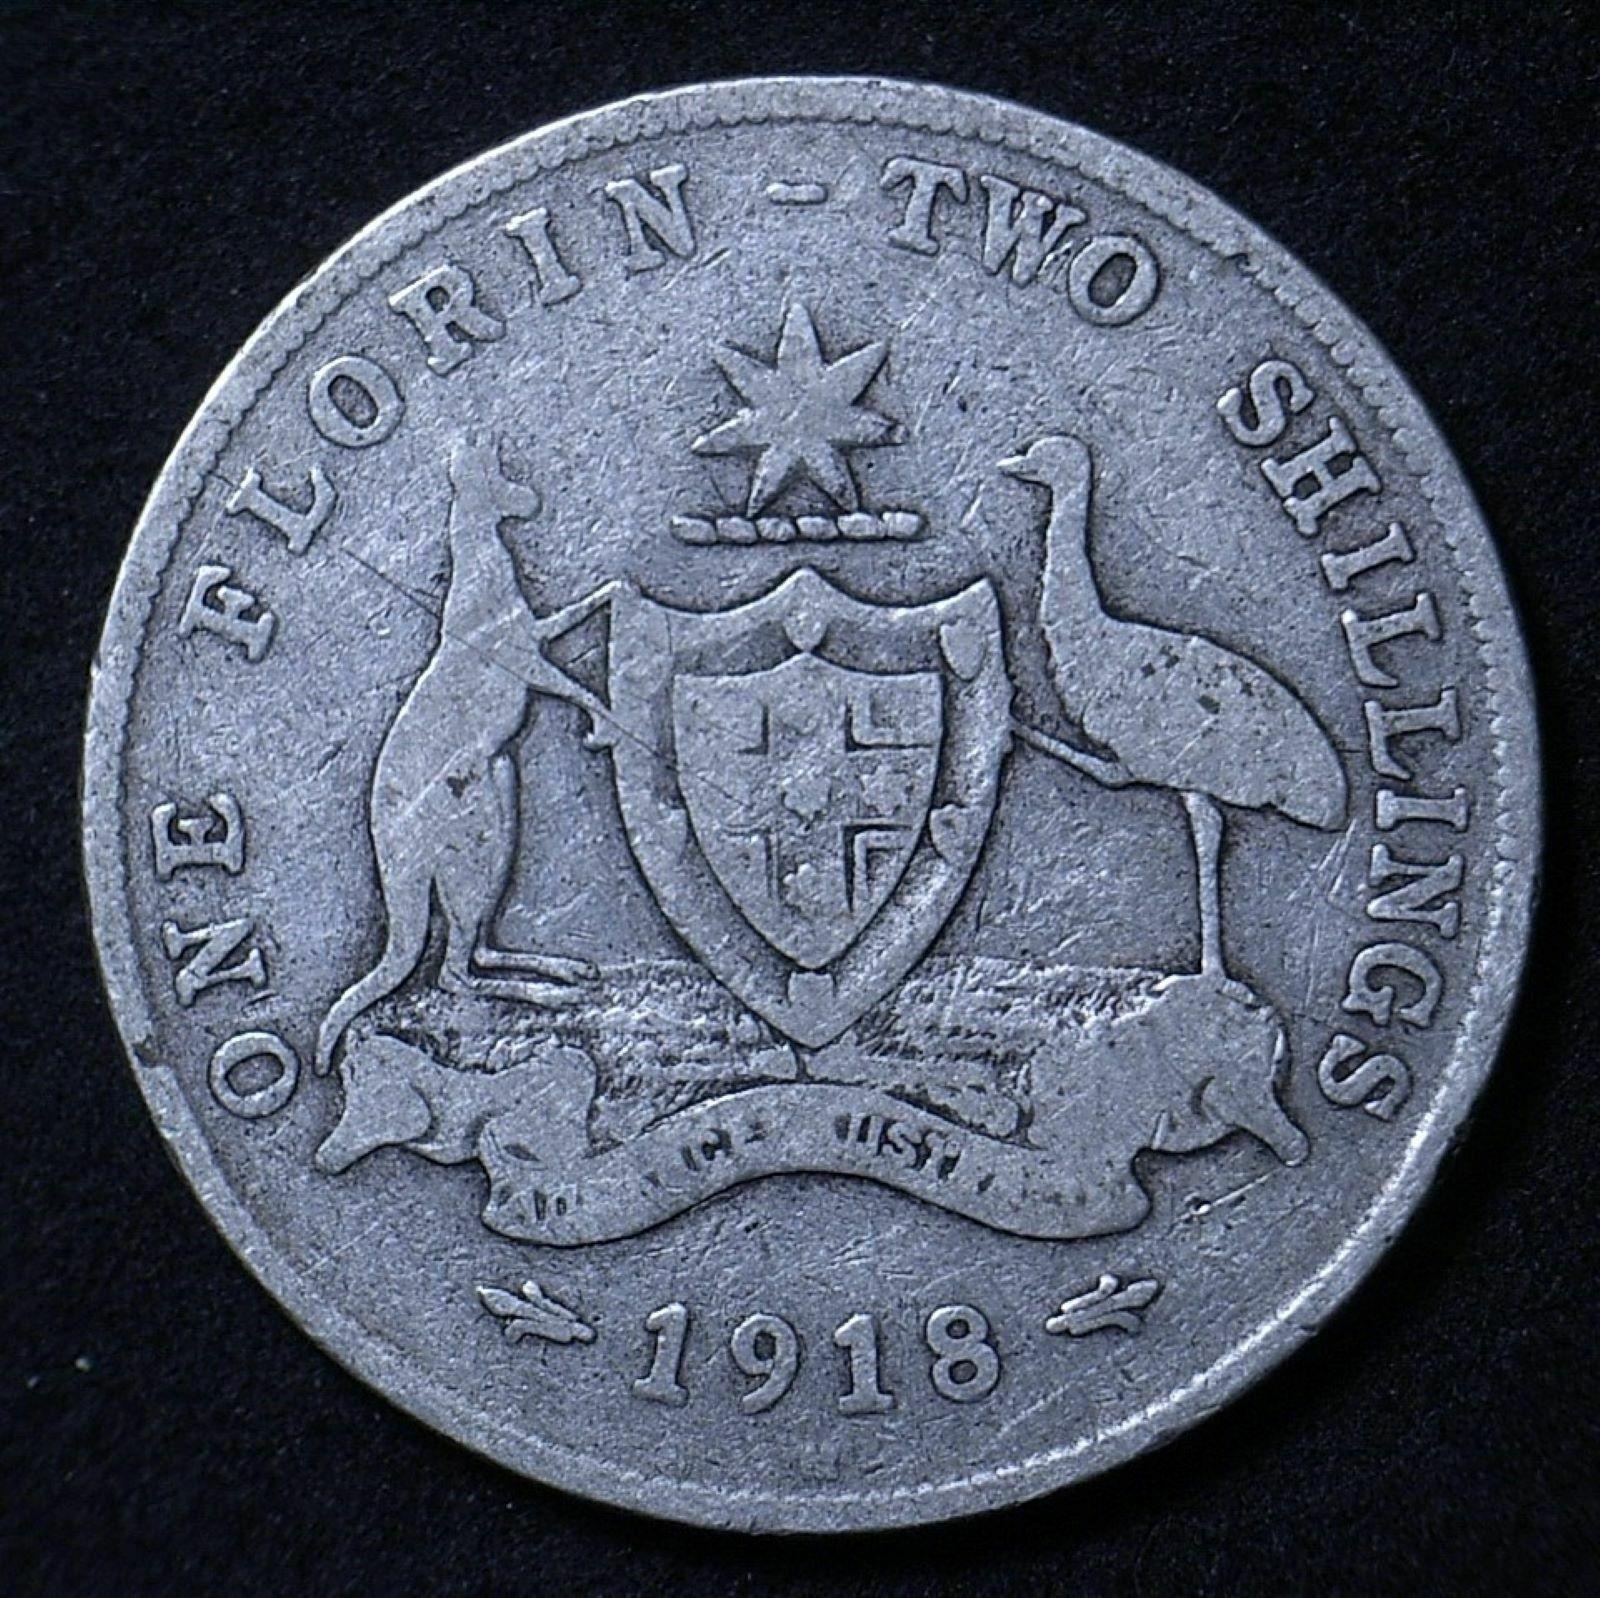 aus-florin-1918m-rev-1-1